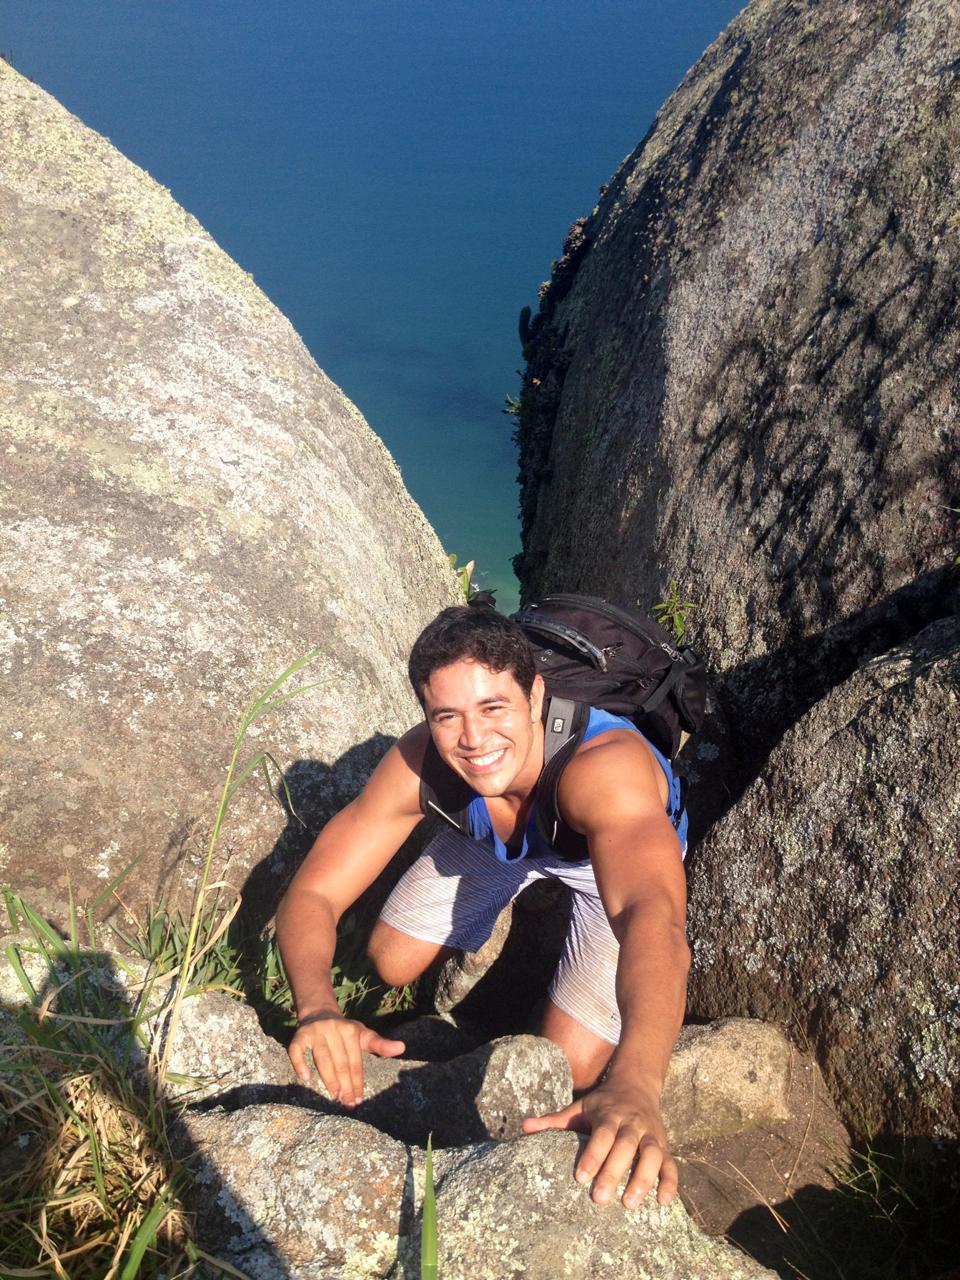 Renan aka Indiana Jones Brasileiro!Haha!Thanks for helping me get to the top of the world! :)